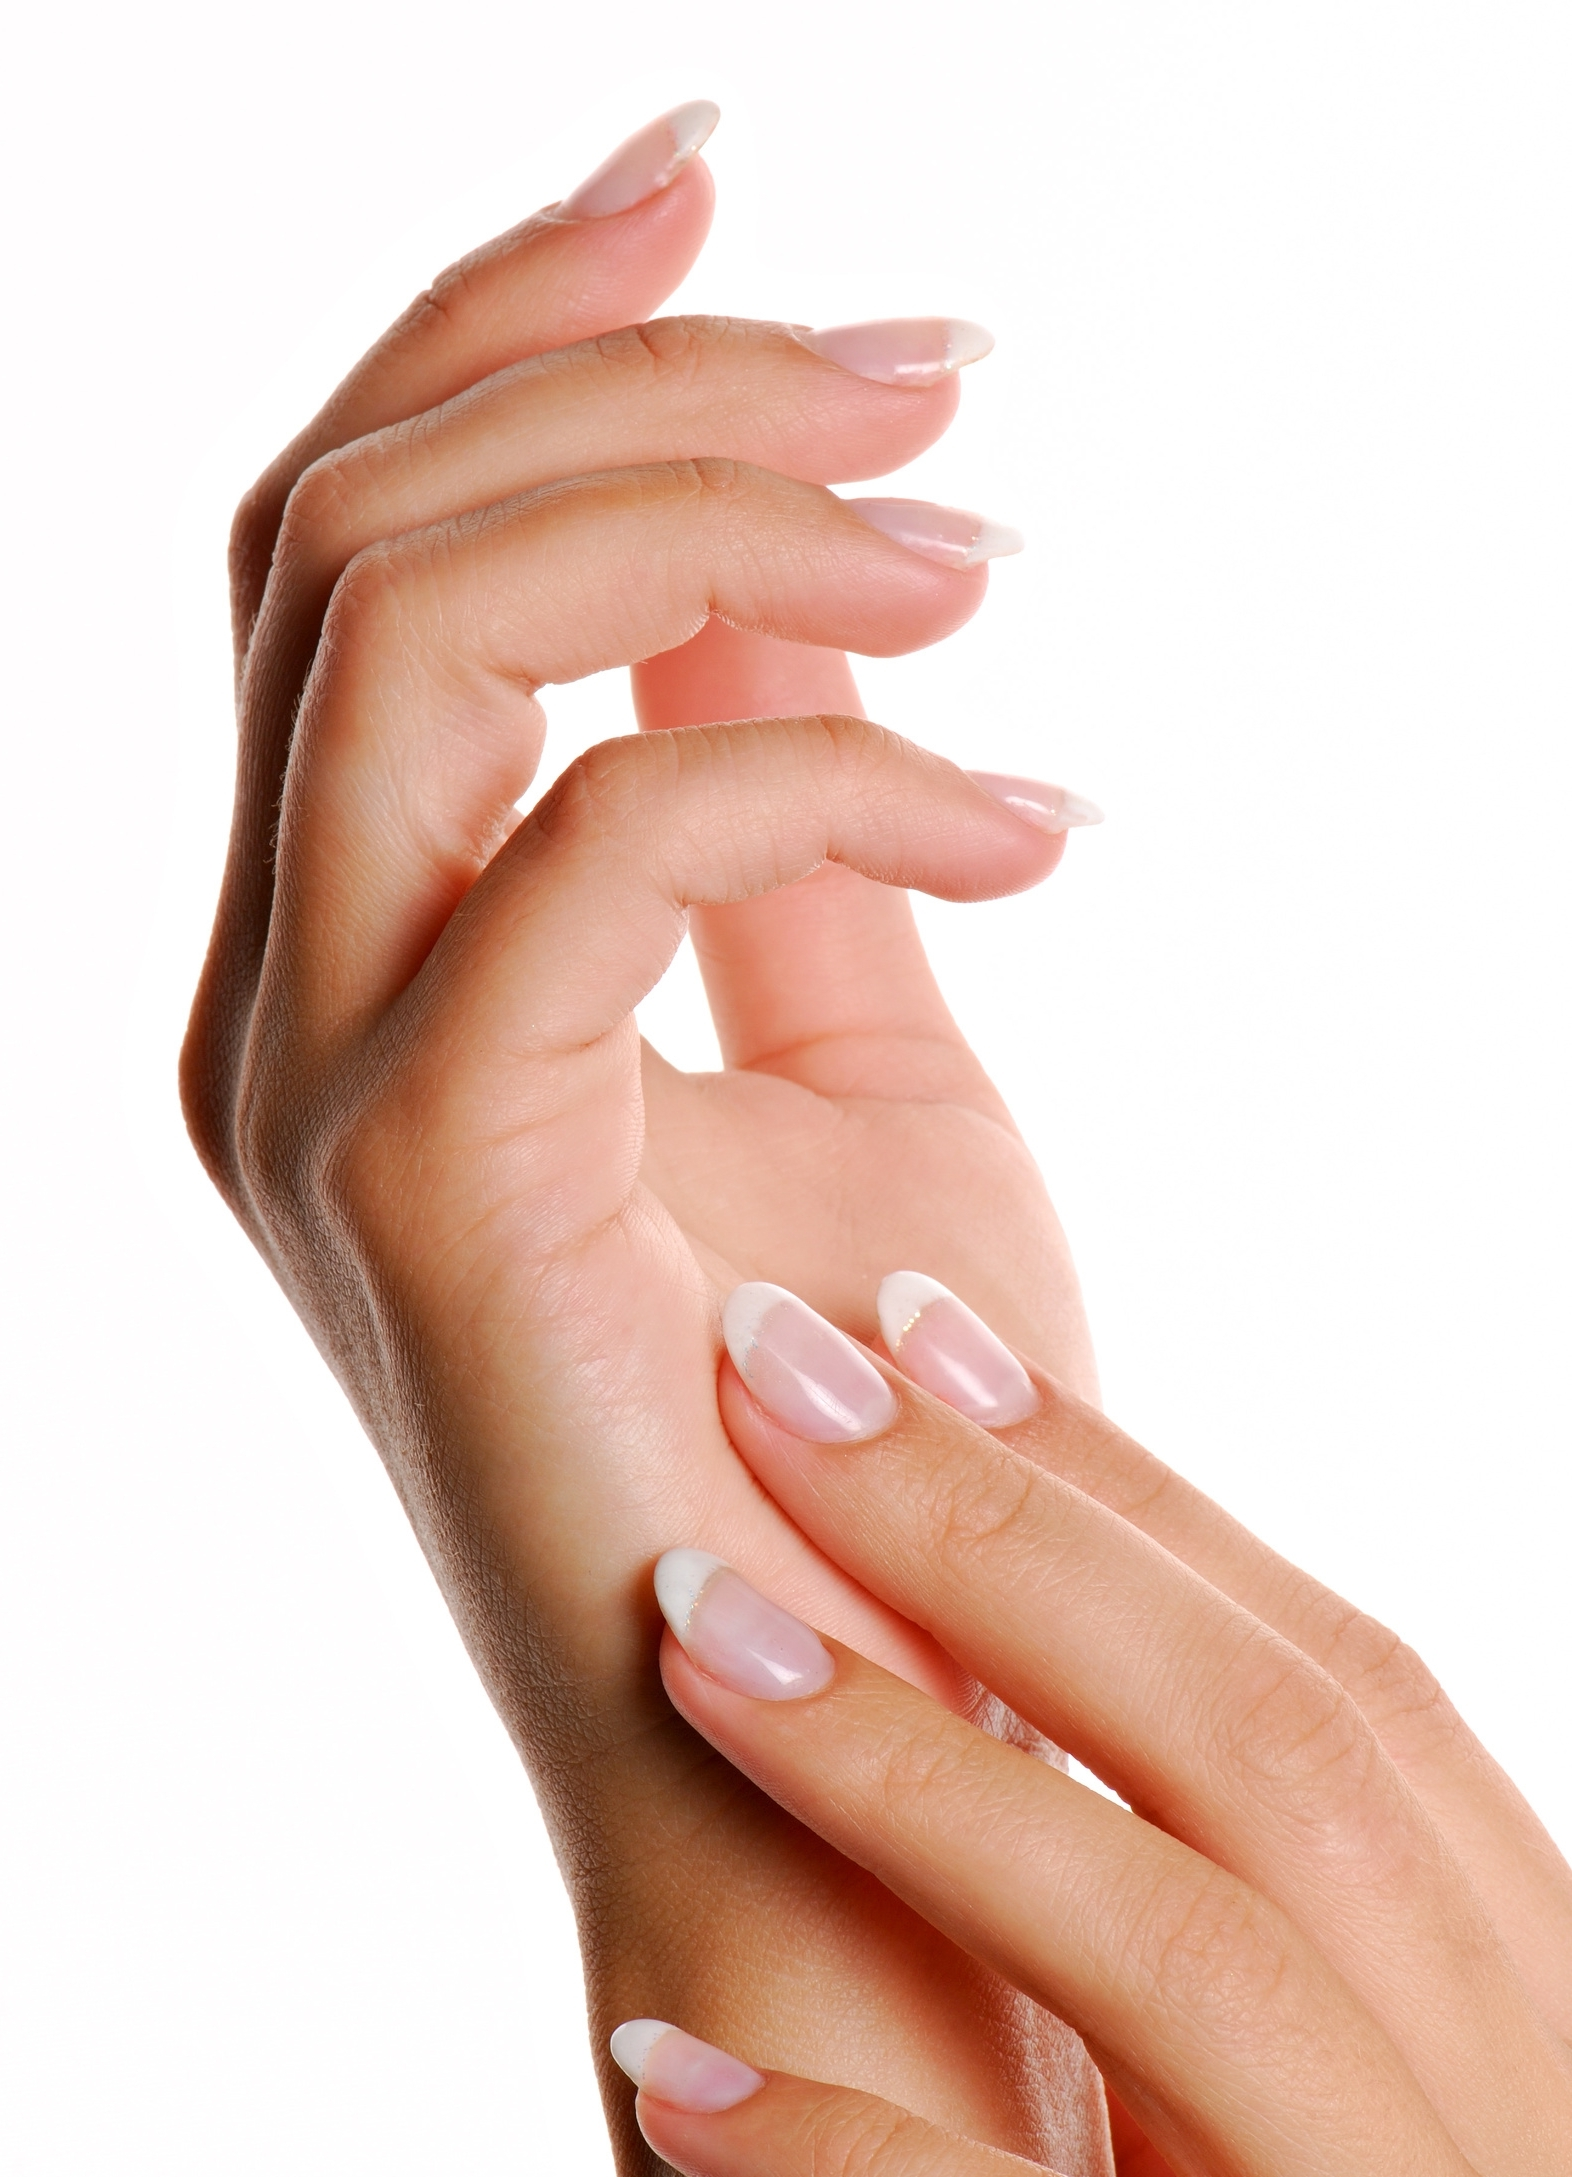 Картинки с руками и ногтями